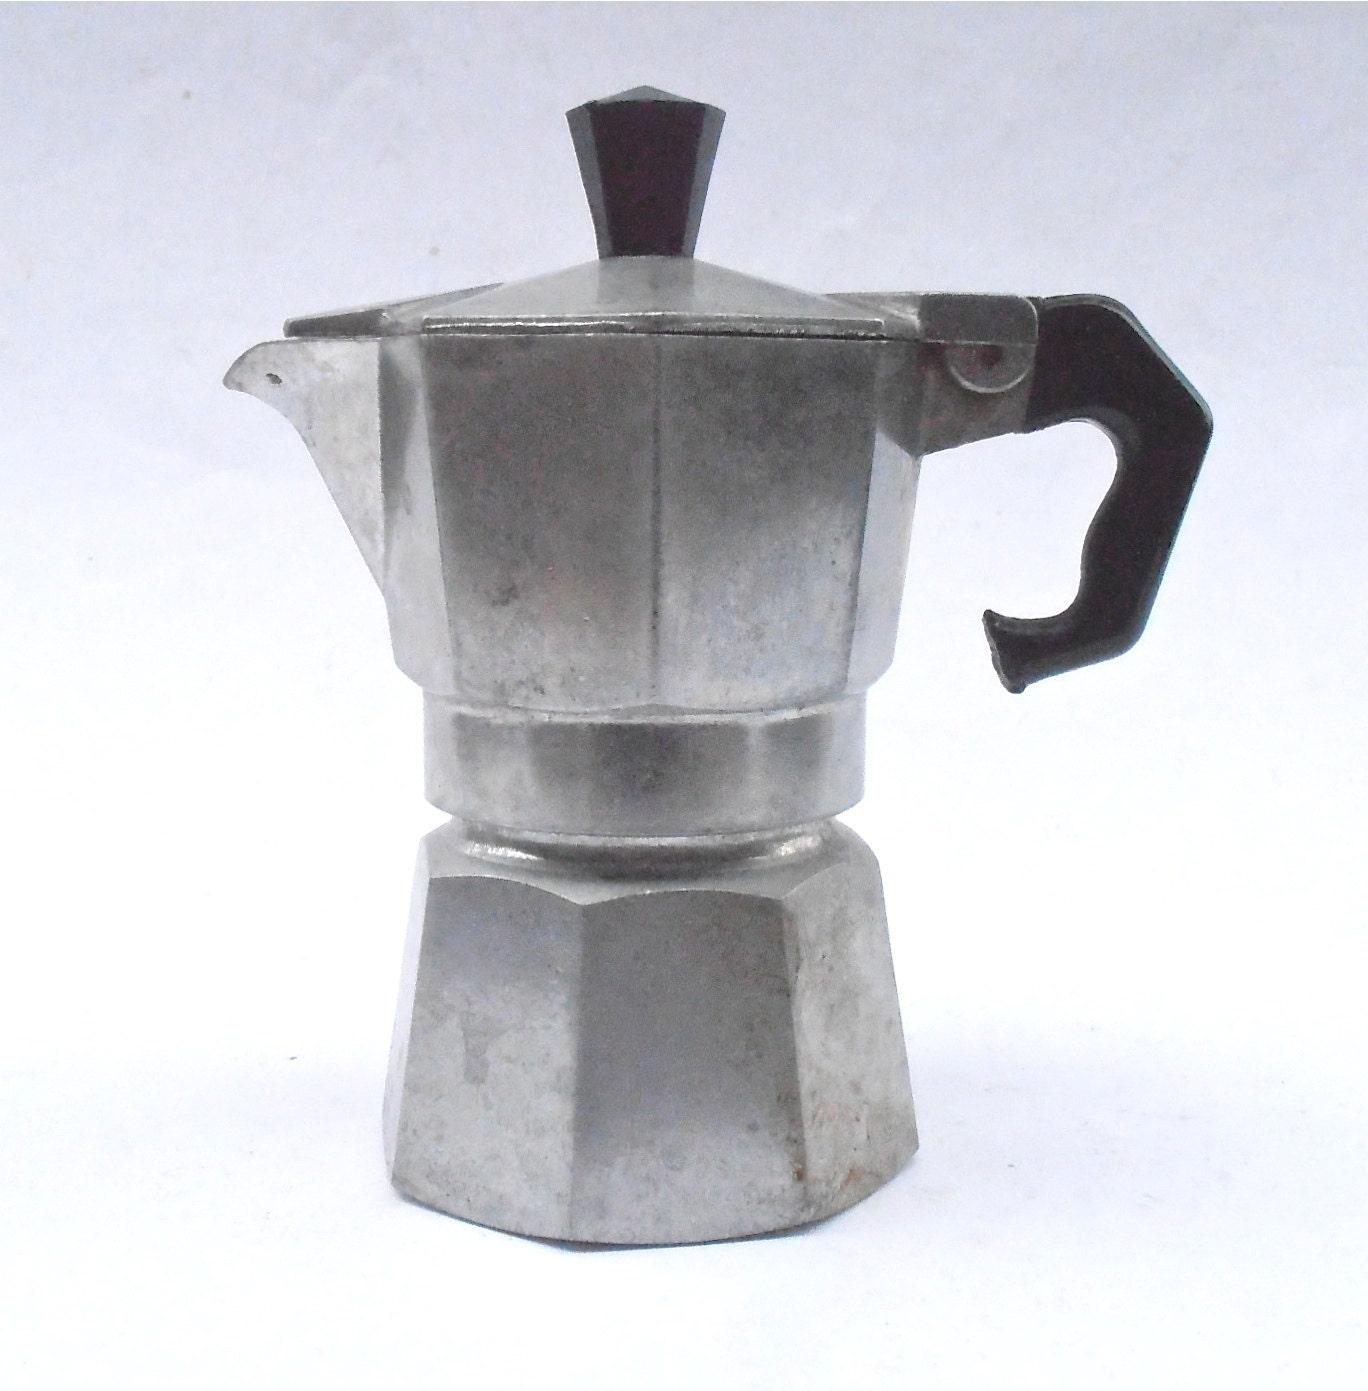 Italian Coffee Maker Aluminum : Vintage One Cup Espresso Coffee Maker Marimba Italian Aluminum